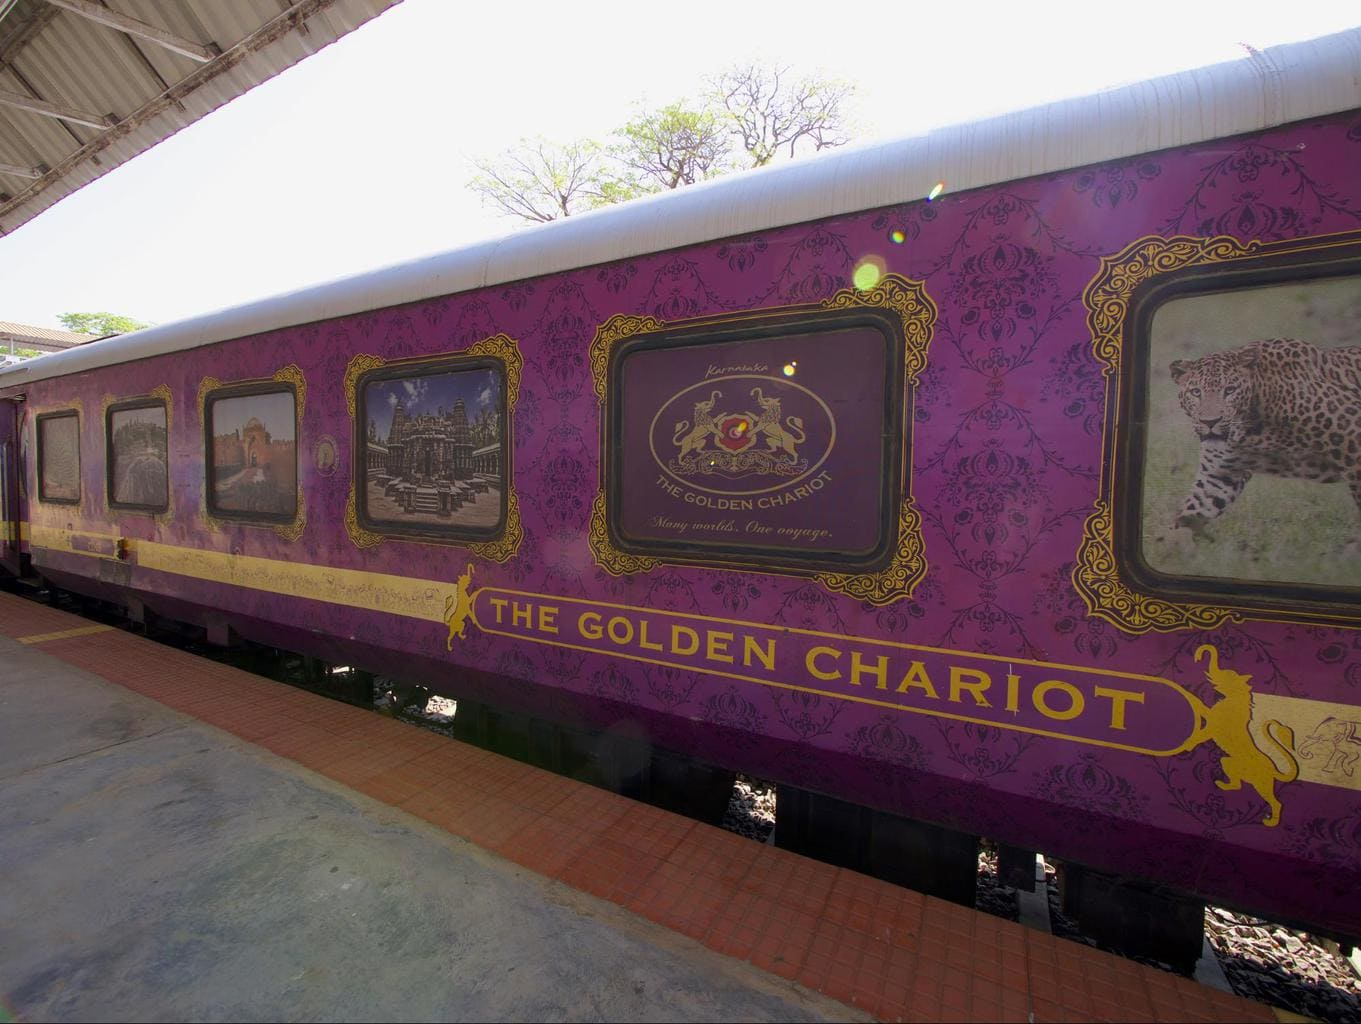 The Golden Chariot exterior